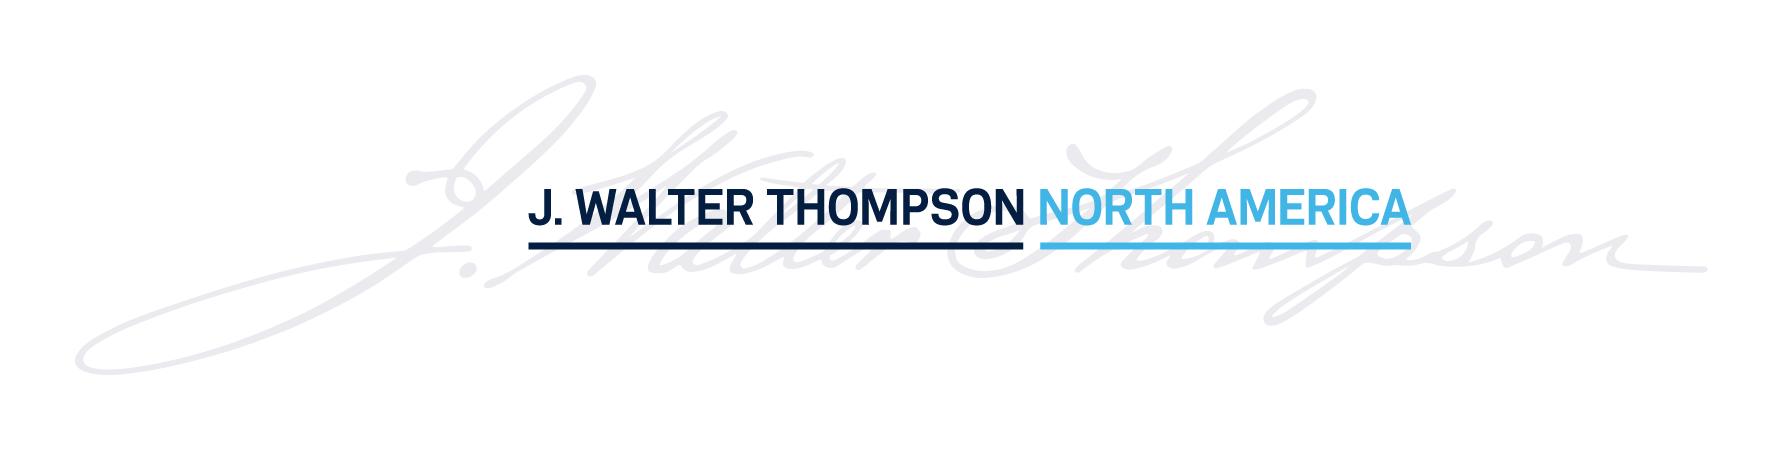 J_Walter_Thompson_JWT_LogoSig_NorthAmerica_RGB.png